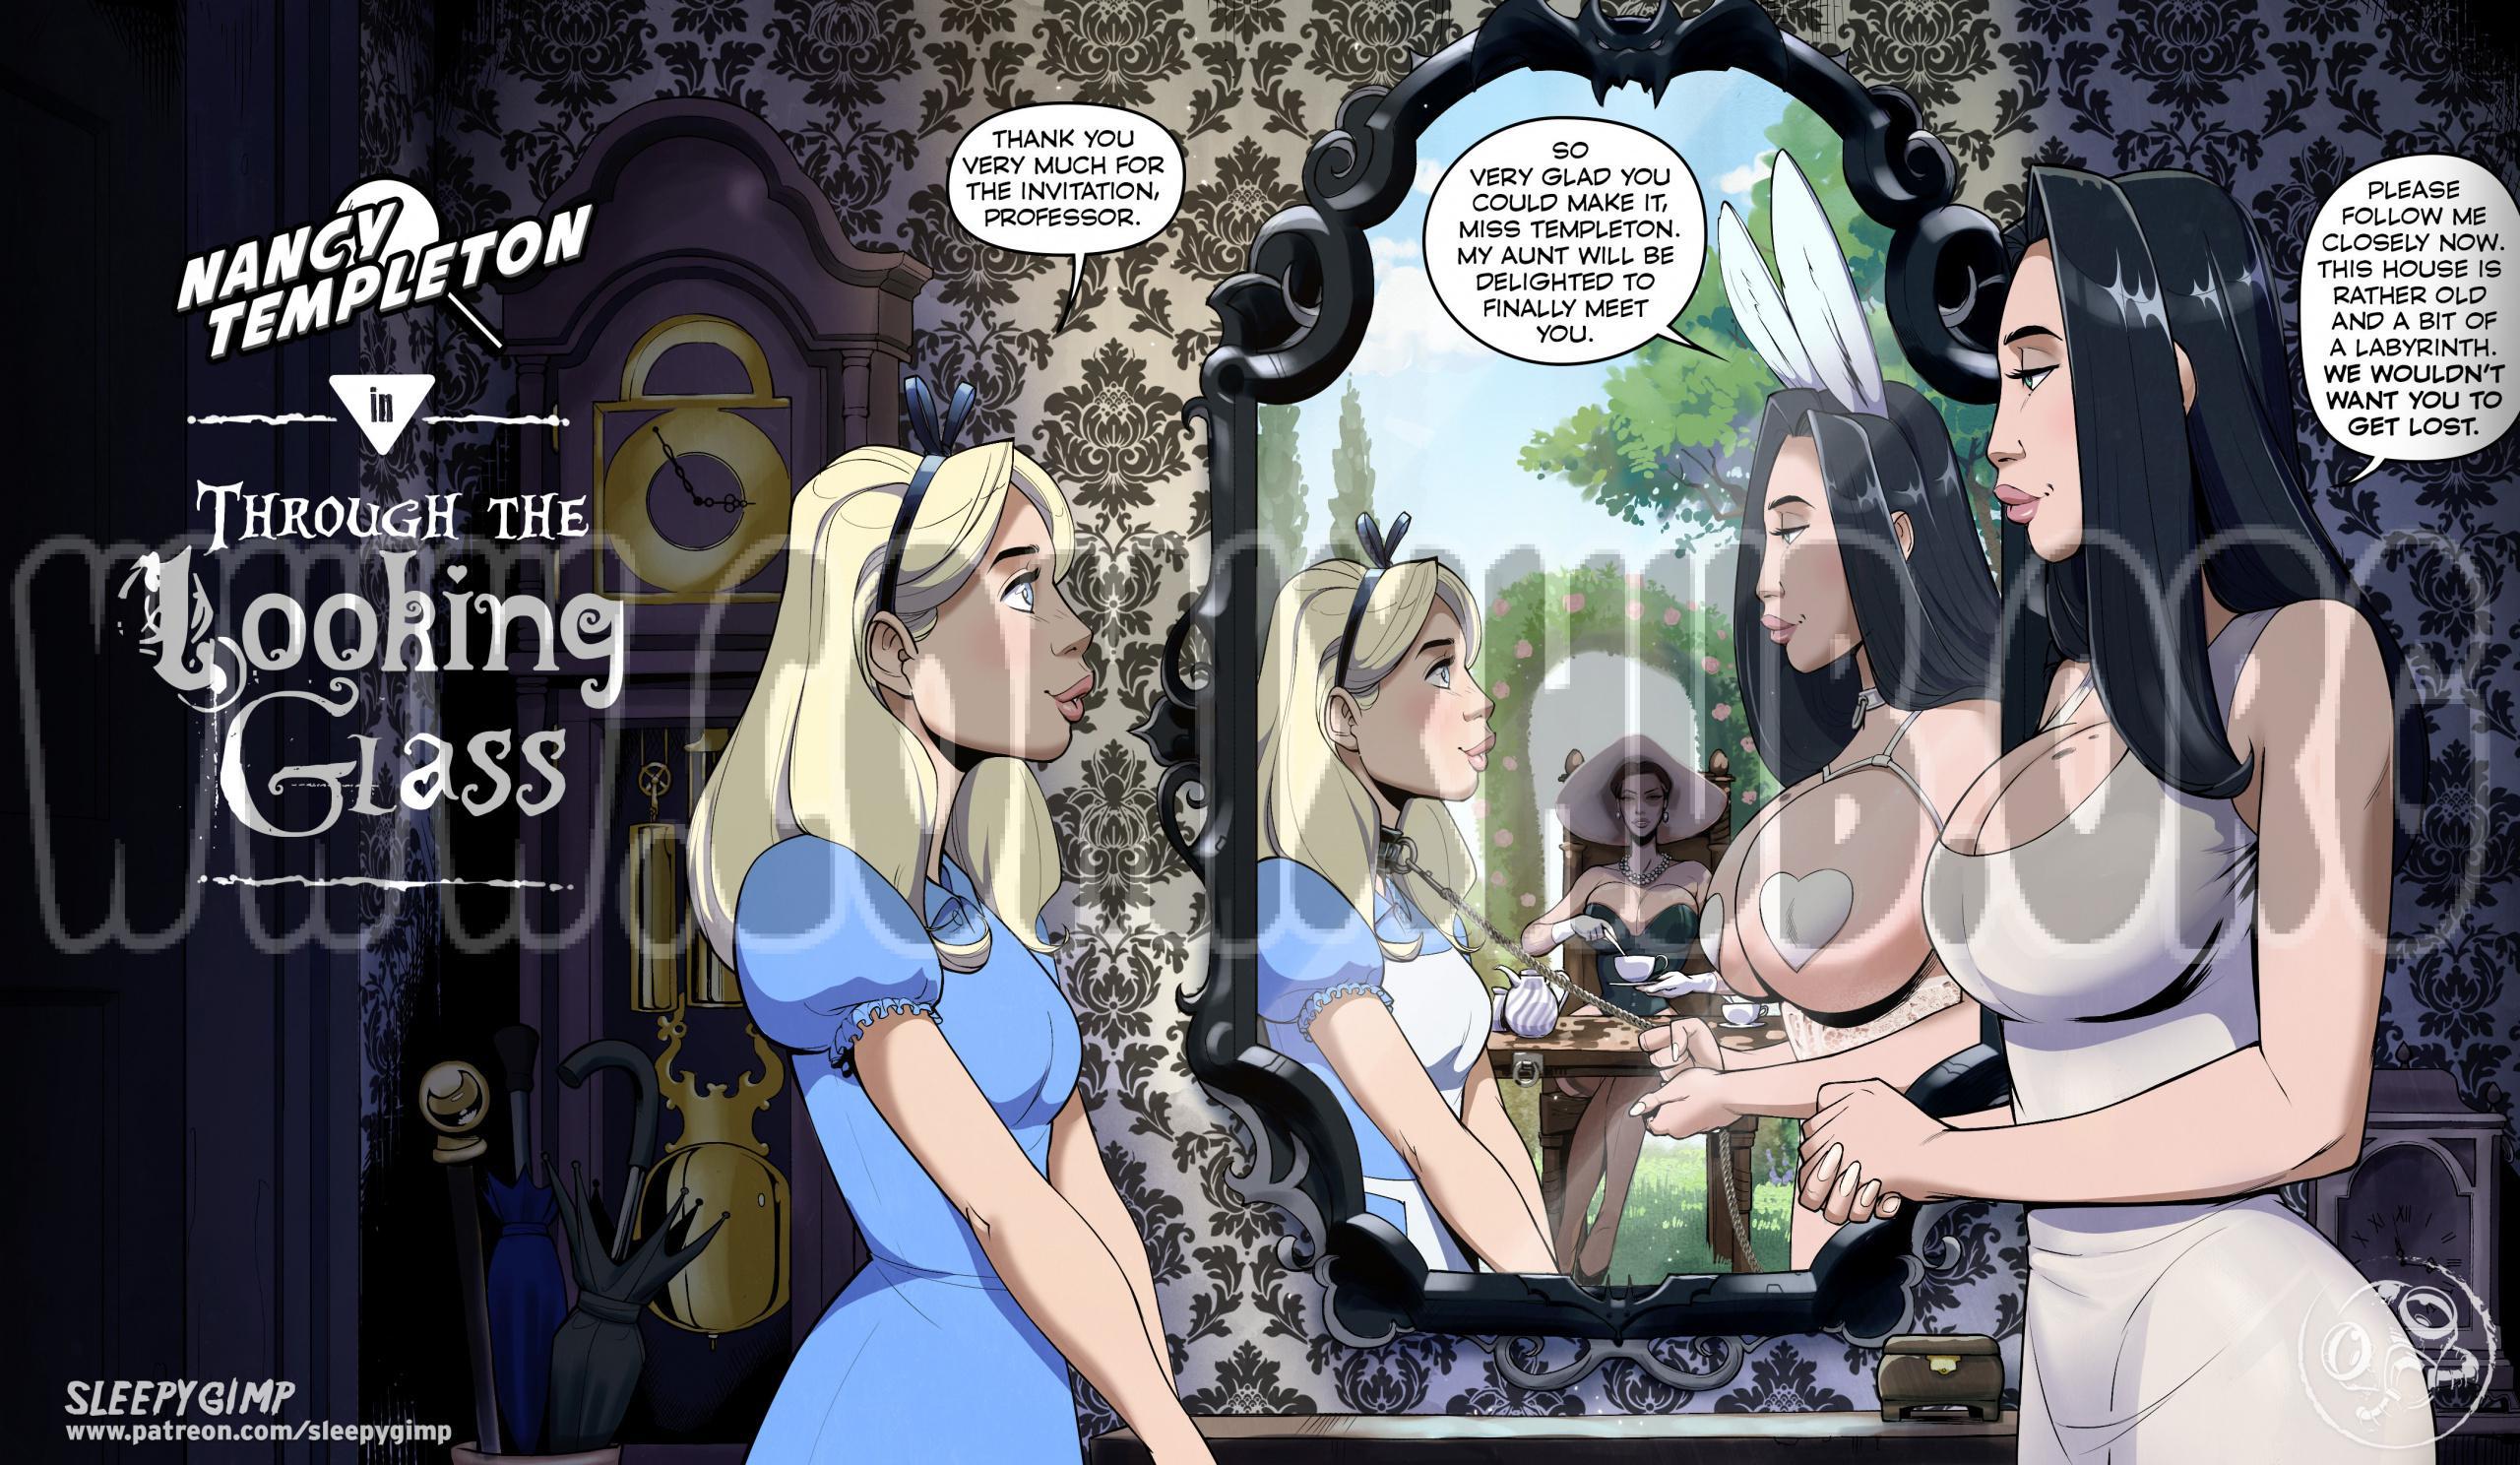 Nancy Templeton - Through the Looking Glass porn comics Oral sex, BDSM, Lesbians, Masturbation, Sex Toys, Tentacles